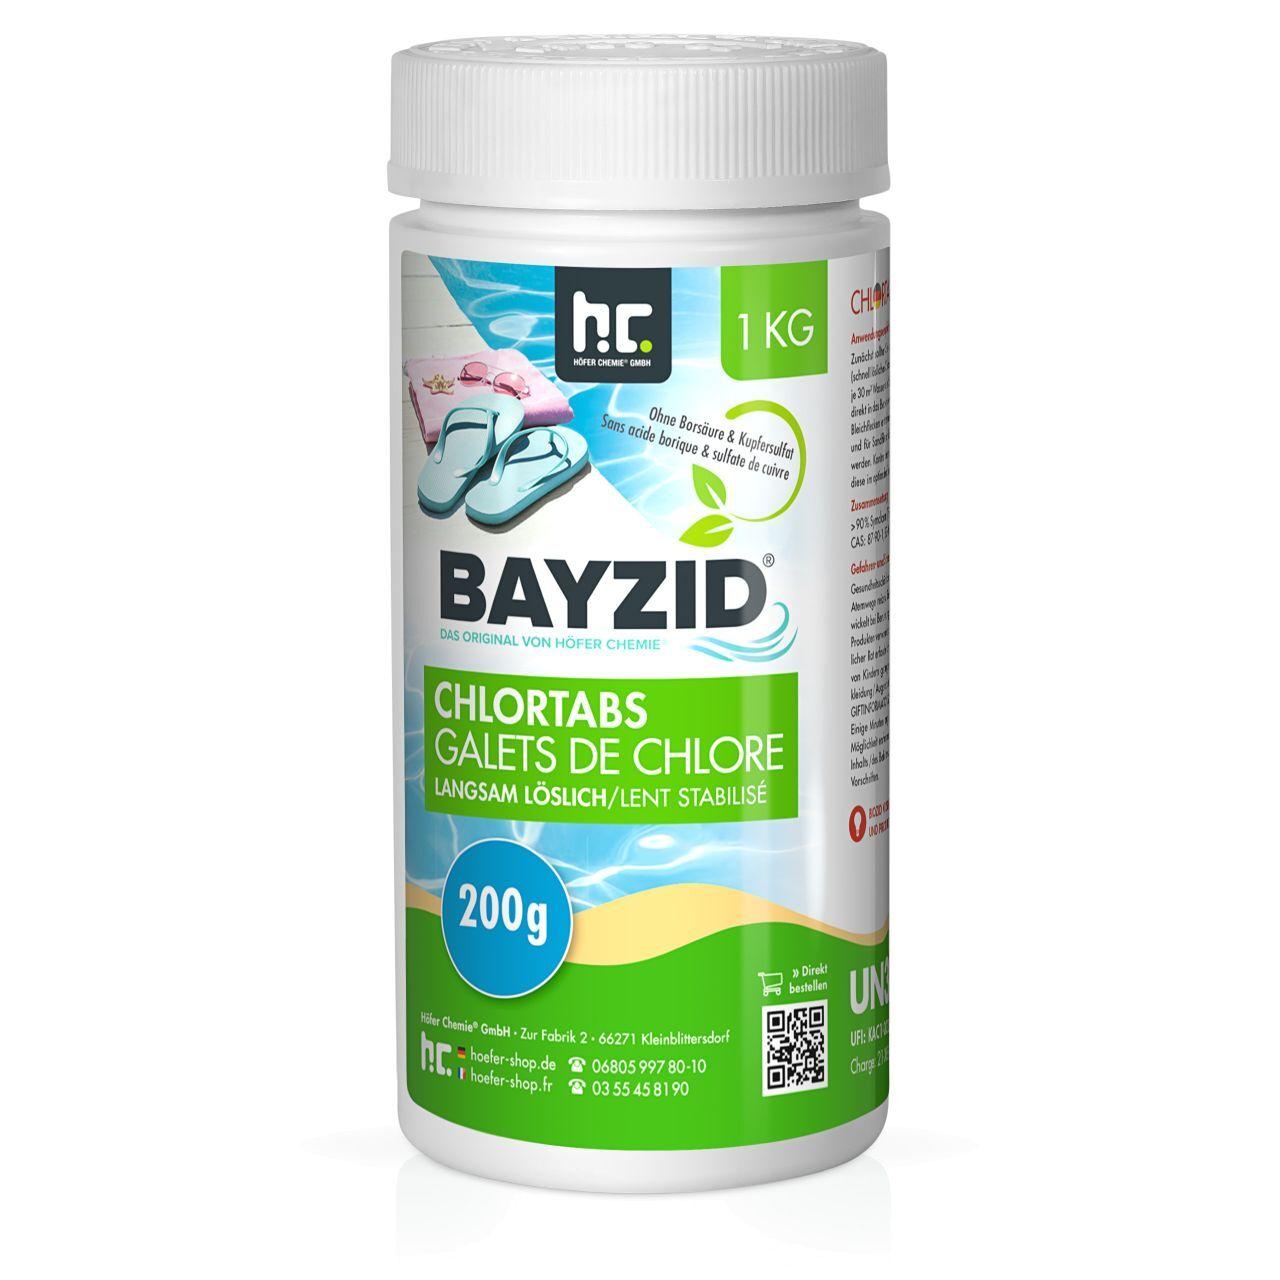 BAYZID 6 kg Bayzid® Galets de chlore lent (200g) (6 x 1 kg)